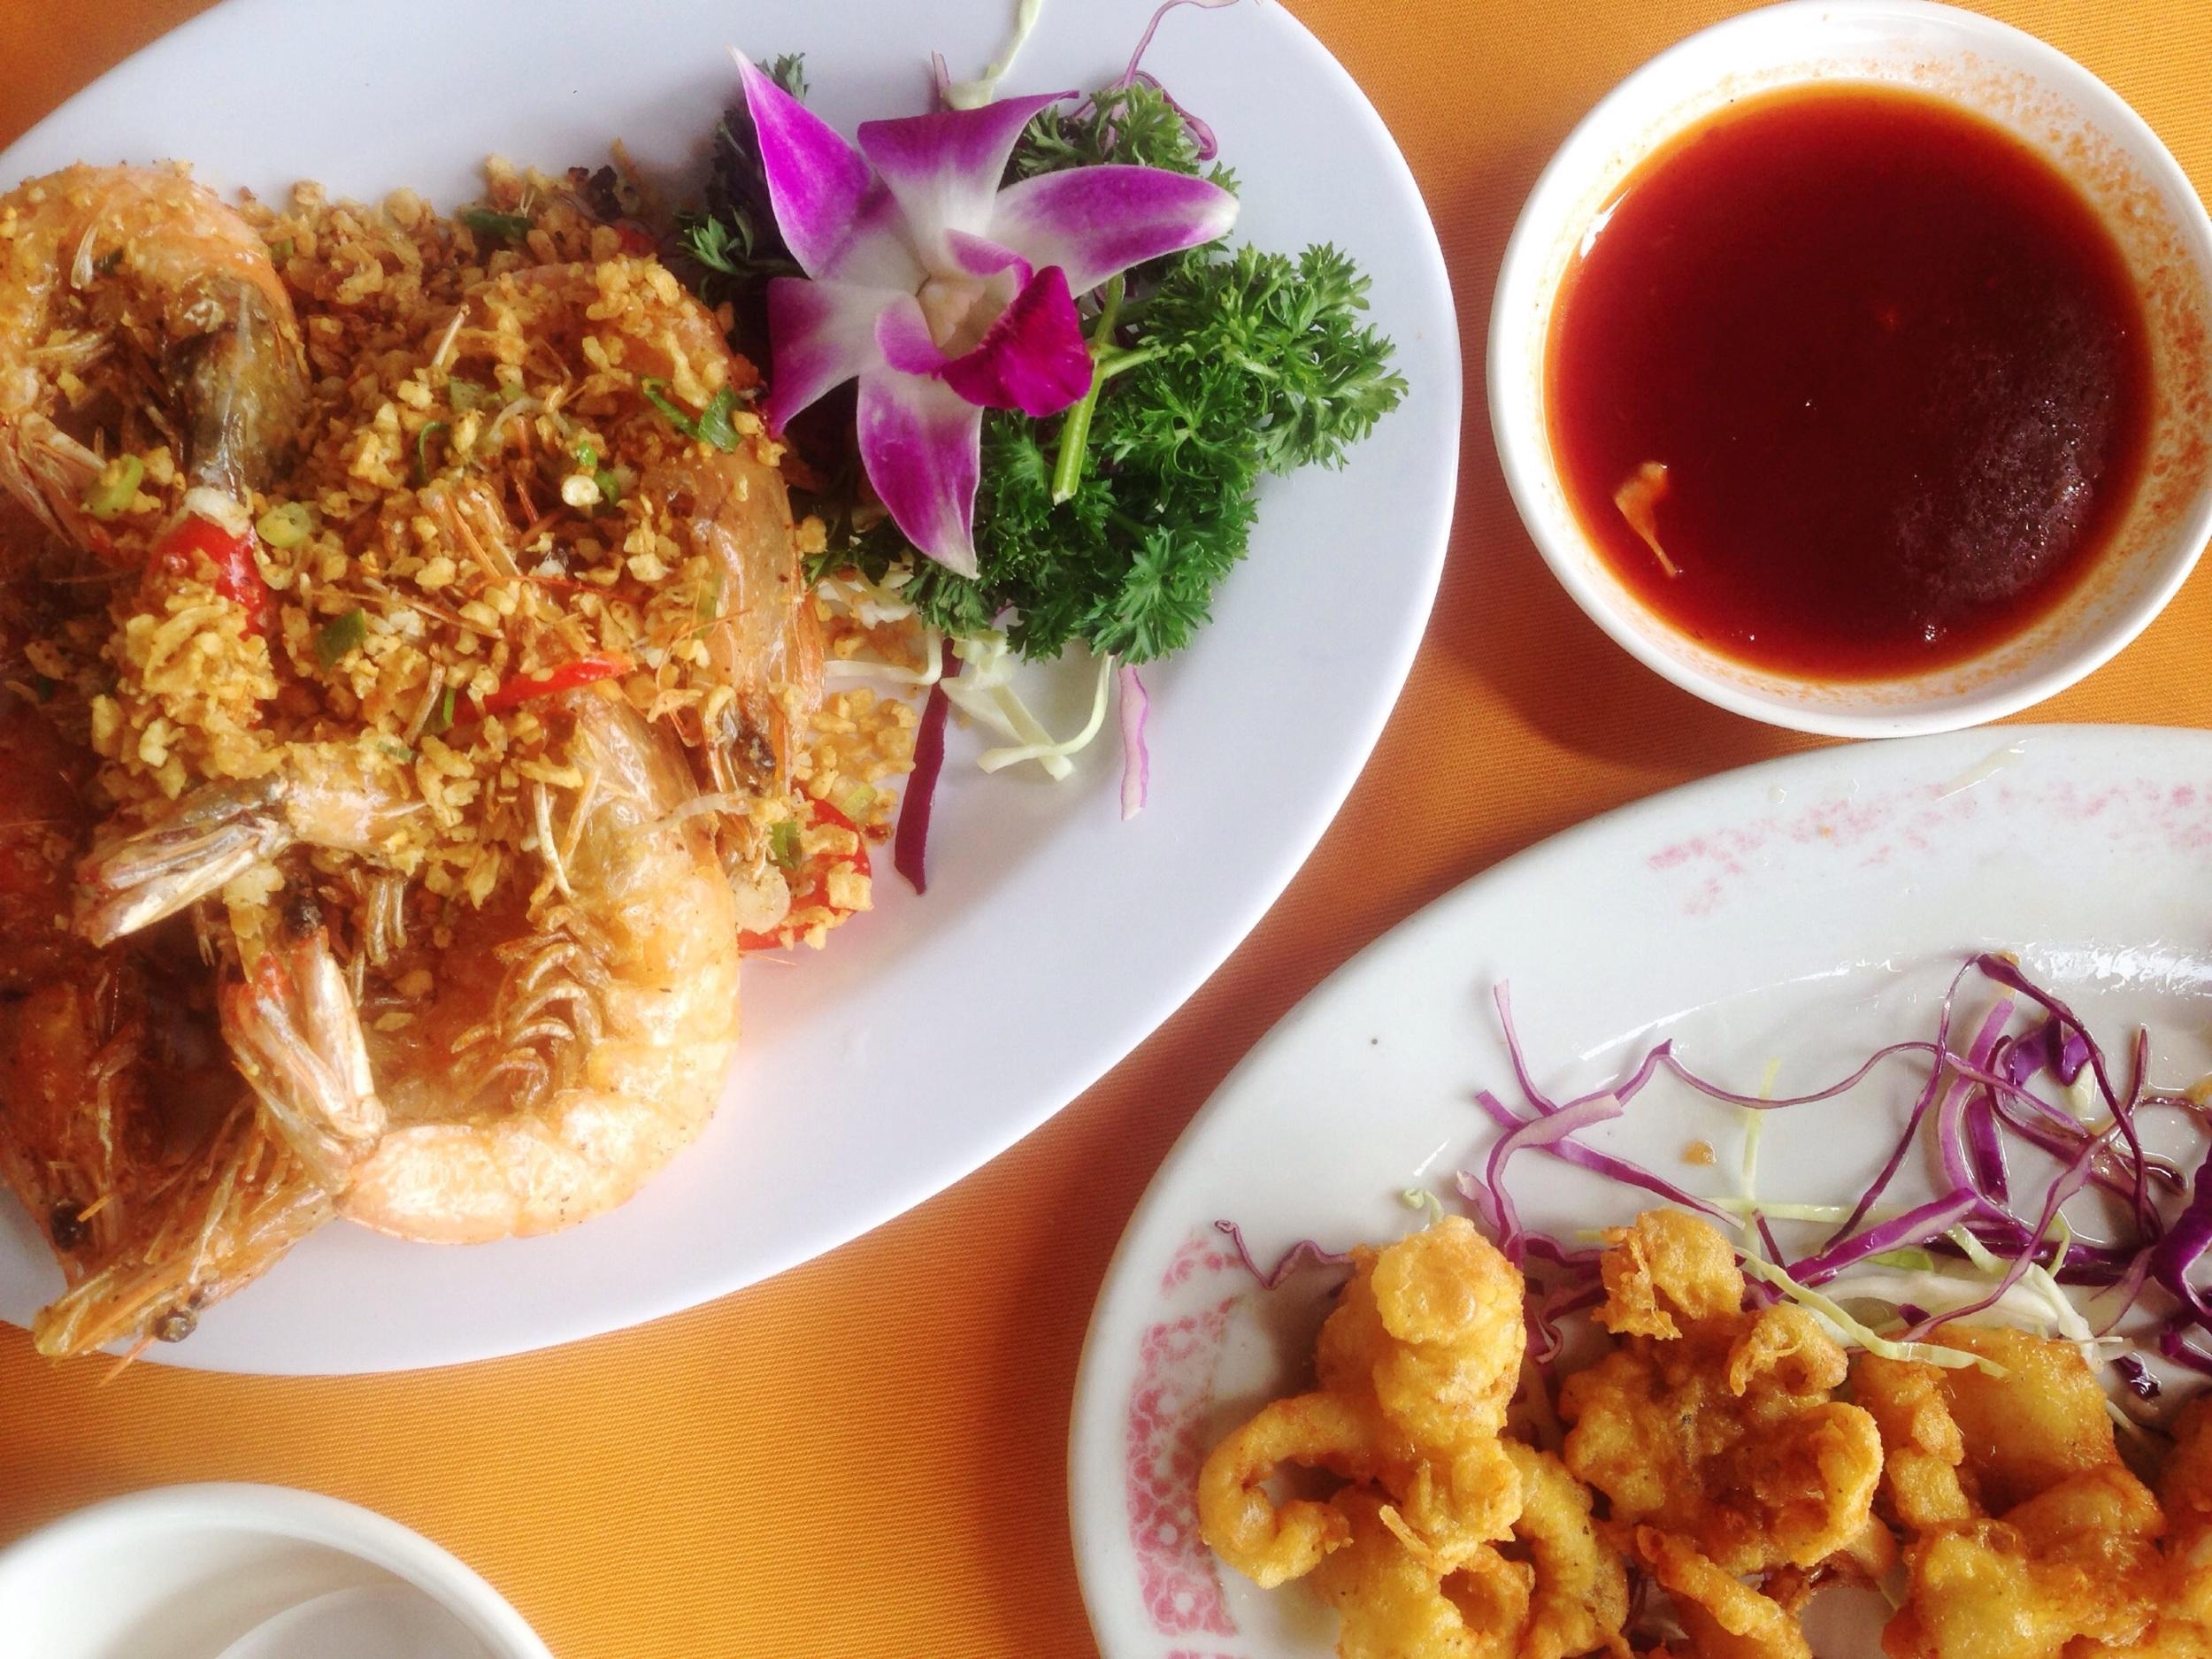 Lamma Seafood Restaurant served the best scallops, prawns and kalamari